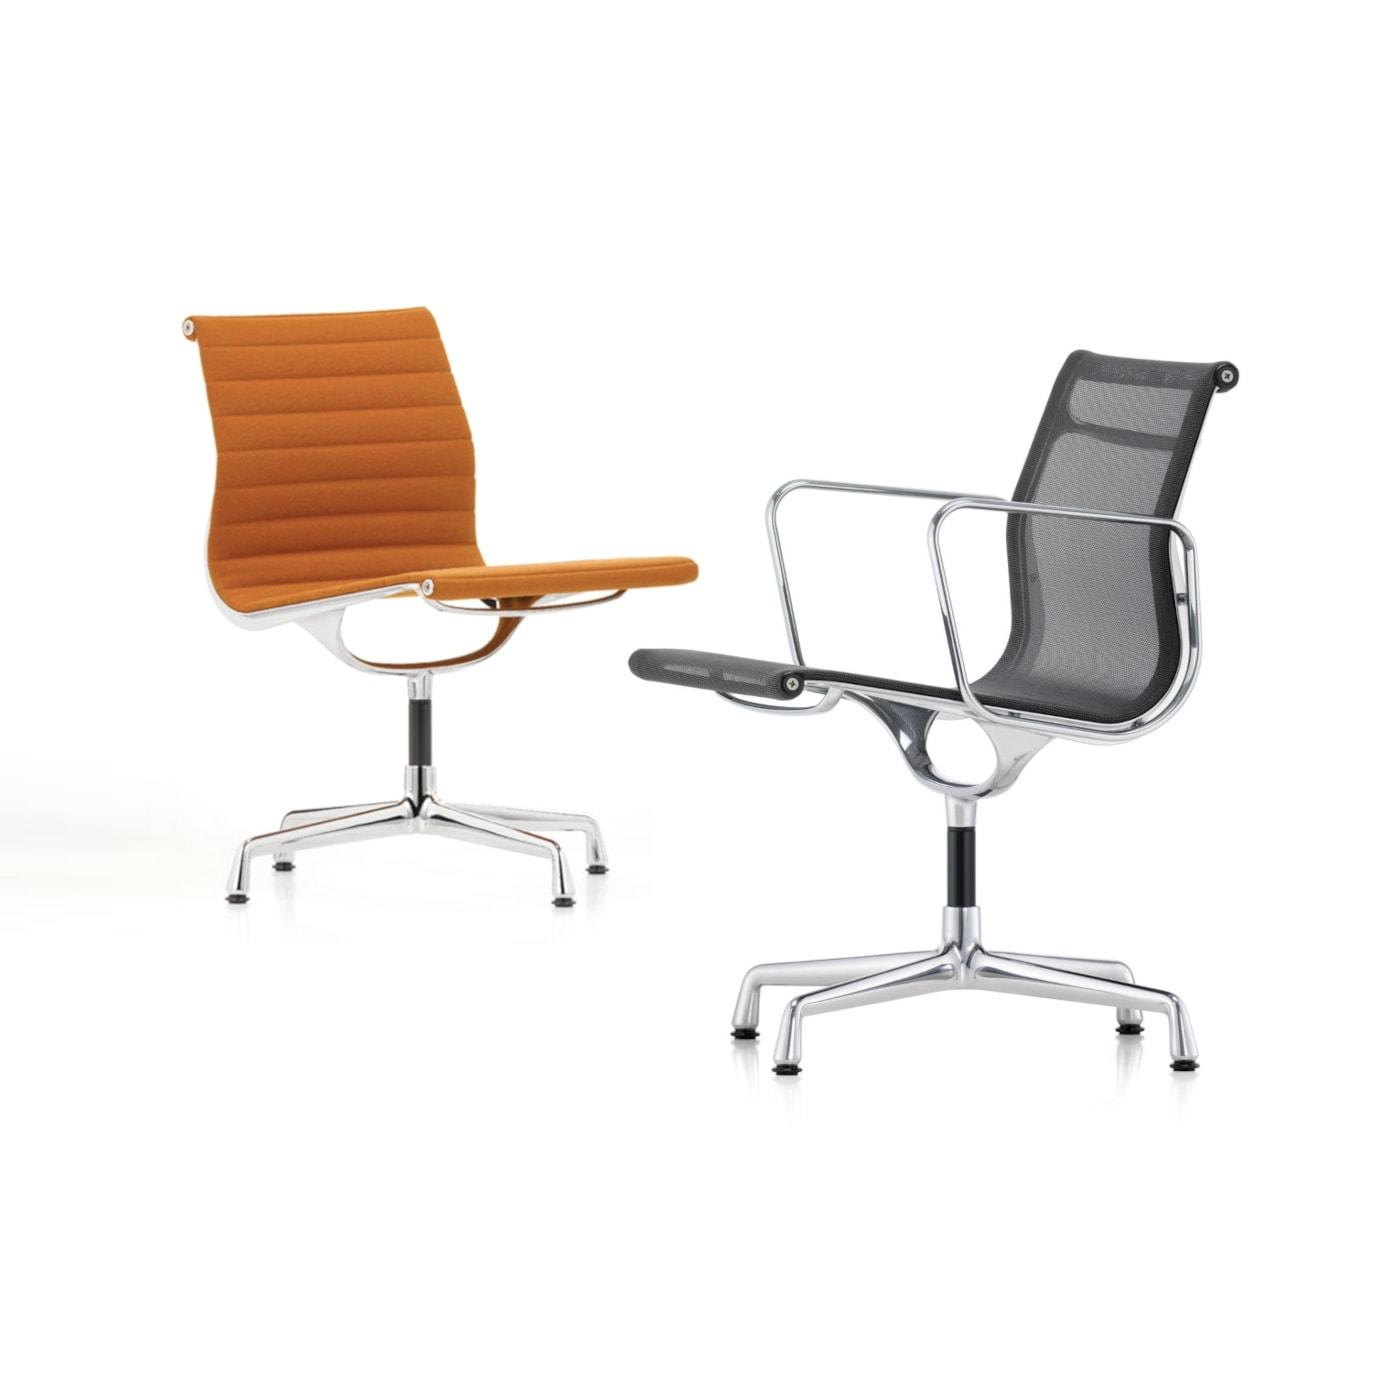 Vitra Aluminium Chairs-EA - 105 - 107 - 108 - vendita online